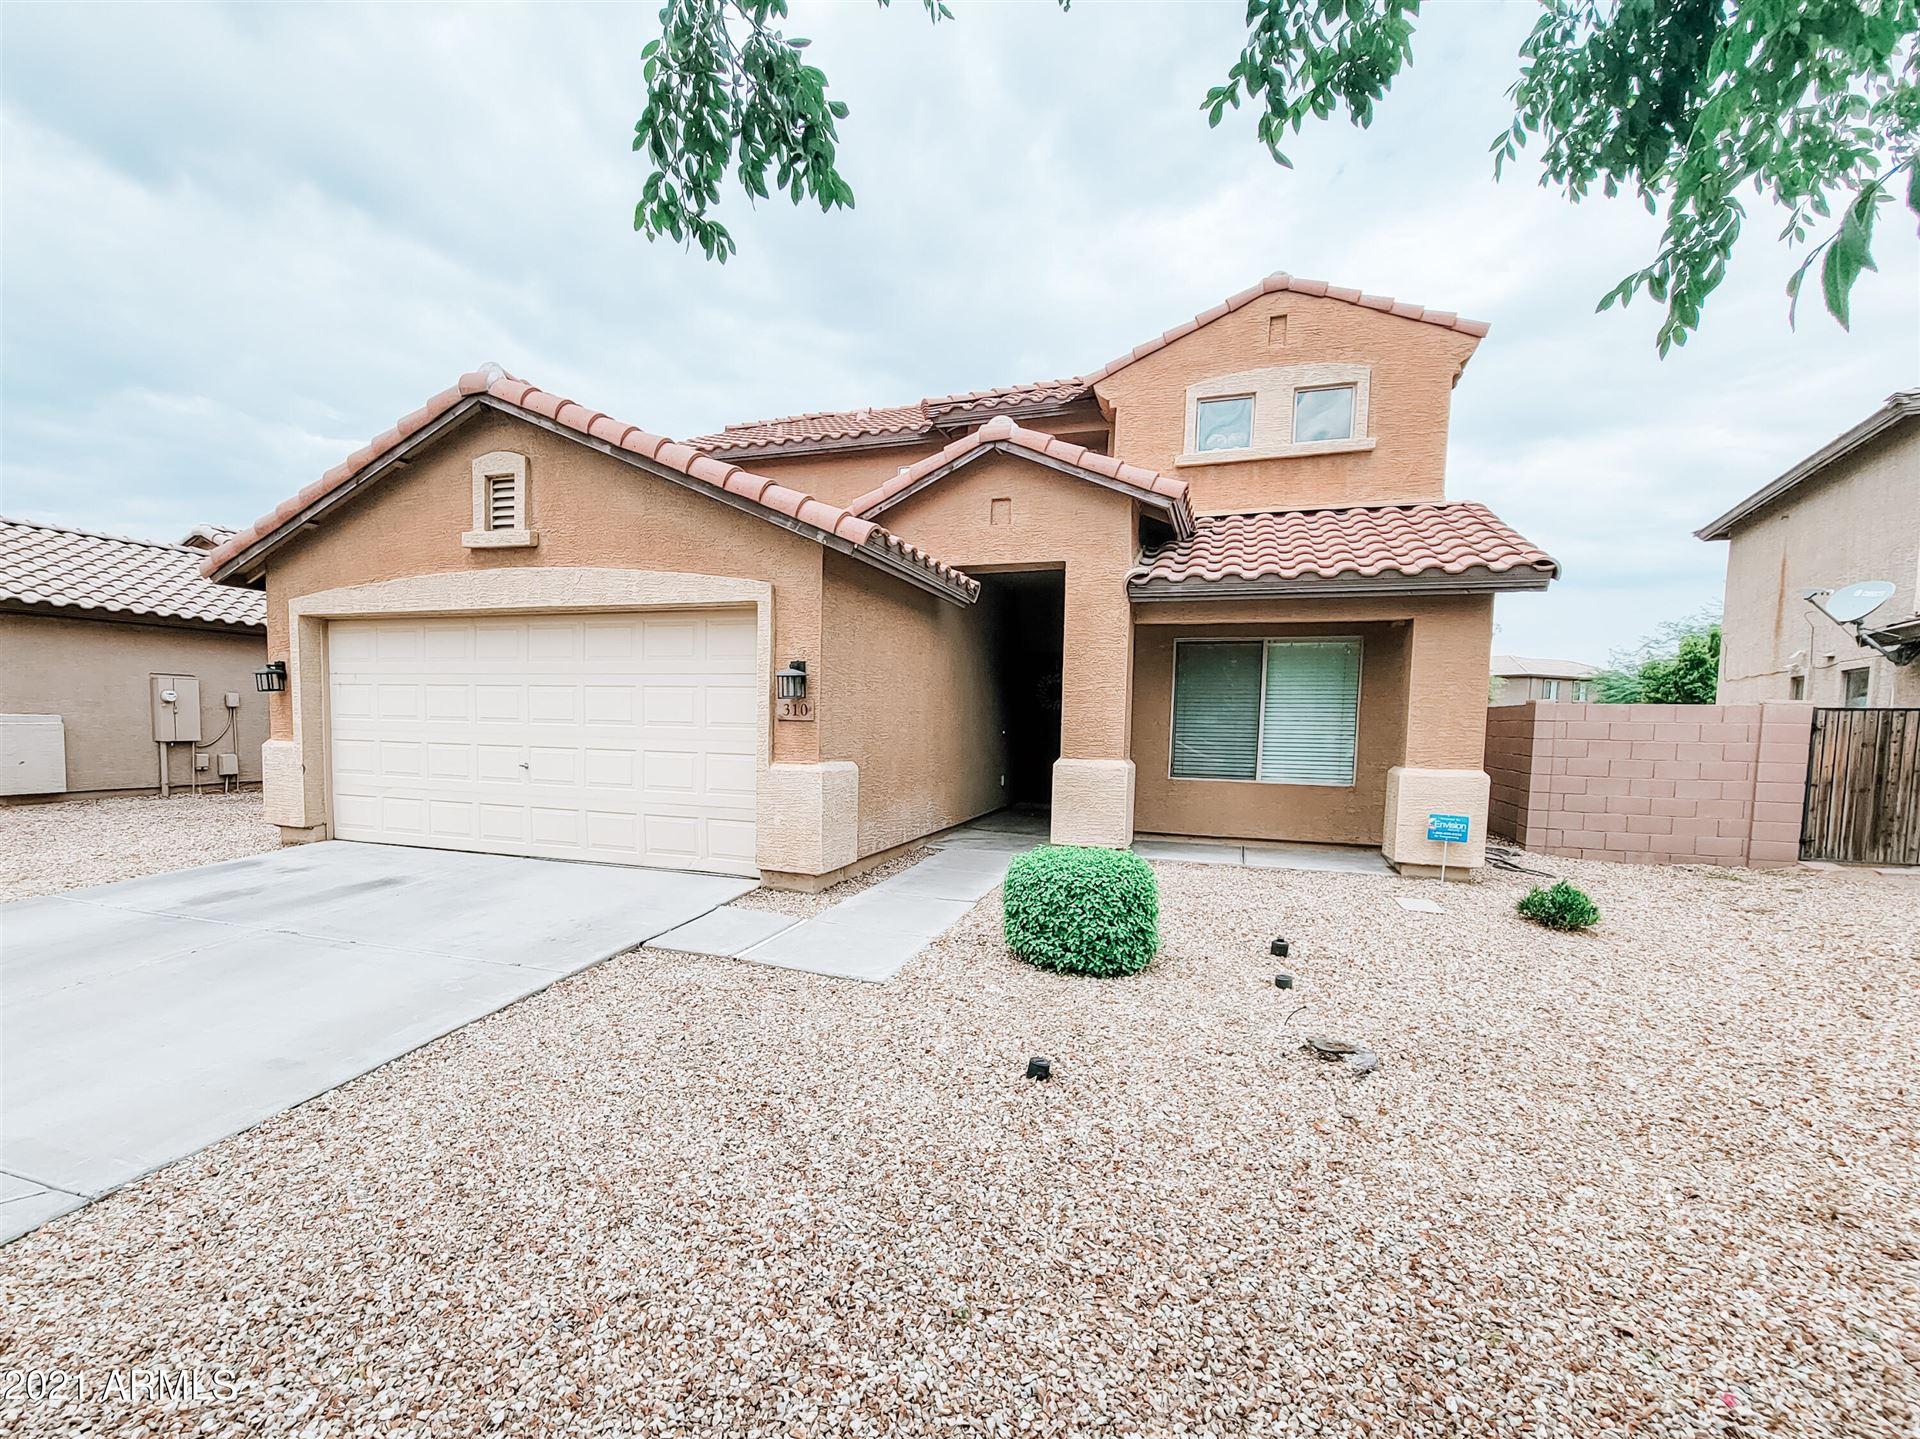 Photo of 310 S 113TH Drive, Avondale, AZ 85323 (MLS # 6268761)